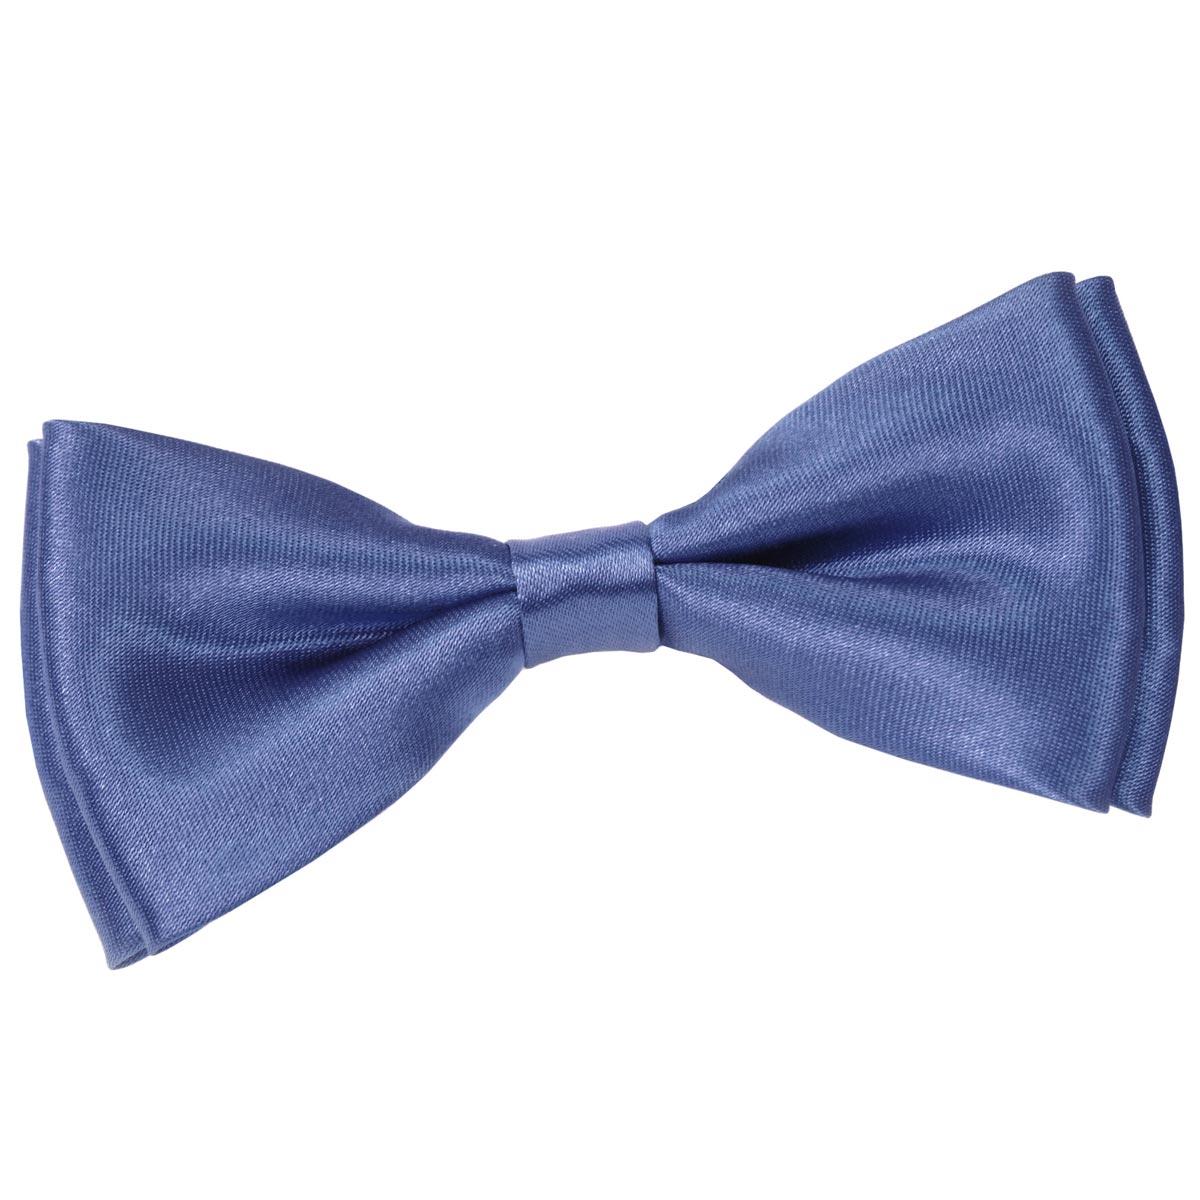 _Noeud-papillon-bleu-jean-dandytouch